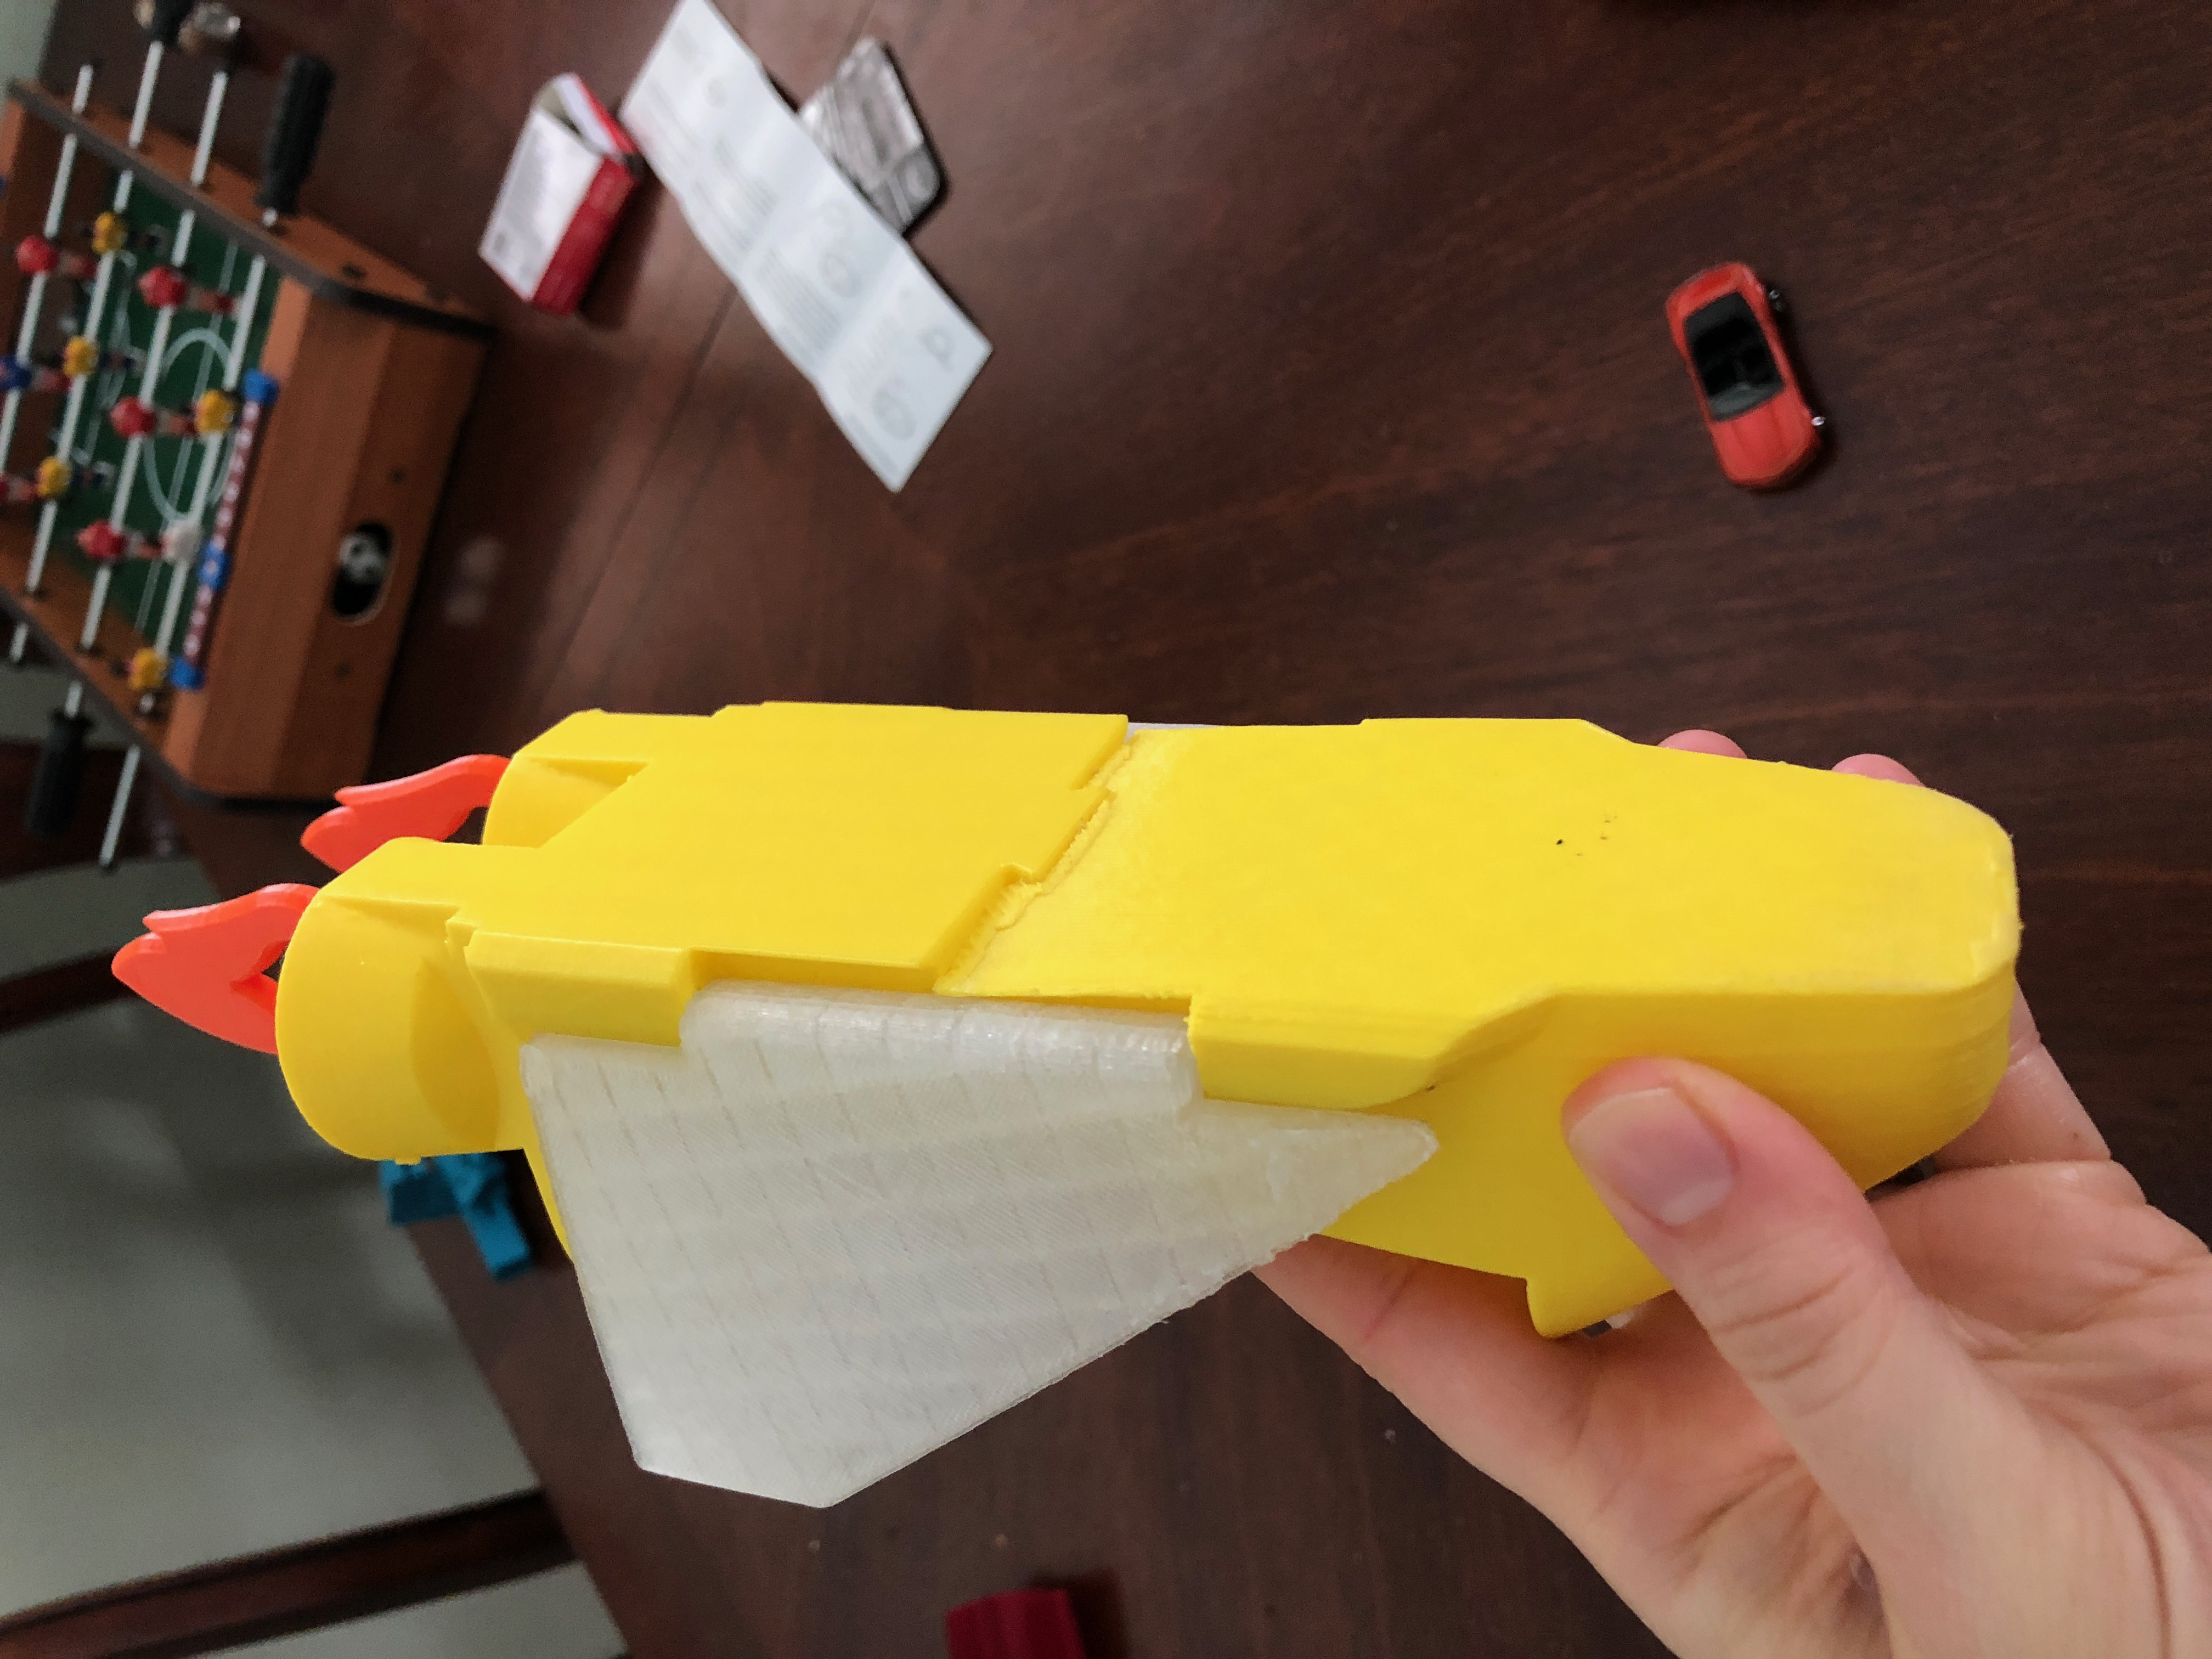 Sigh... Makerbot... :/